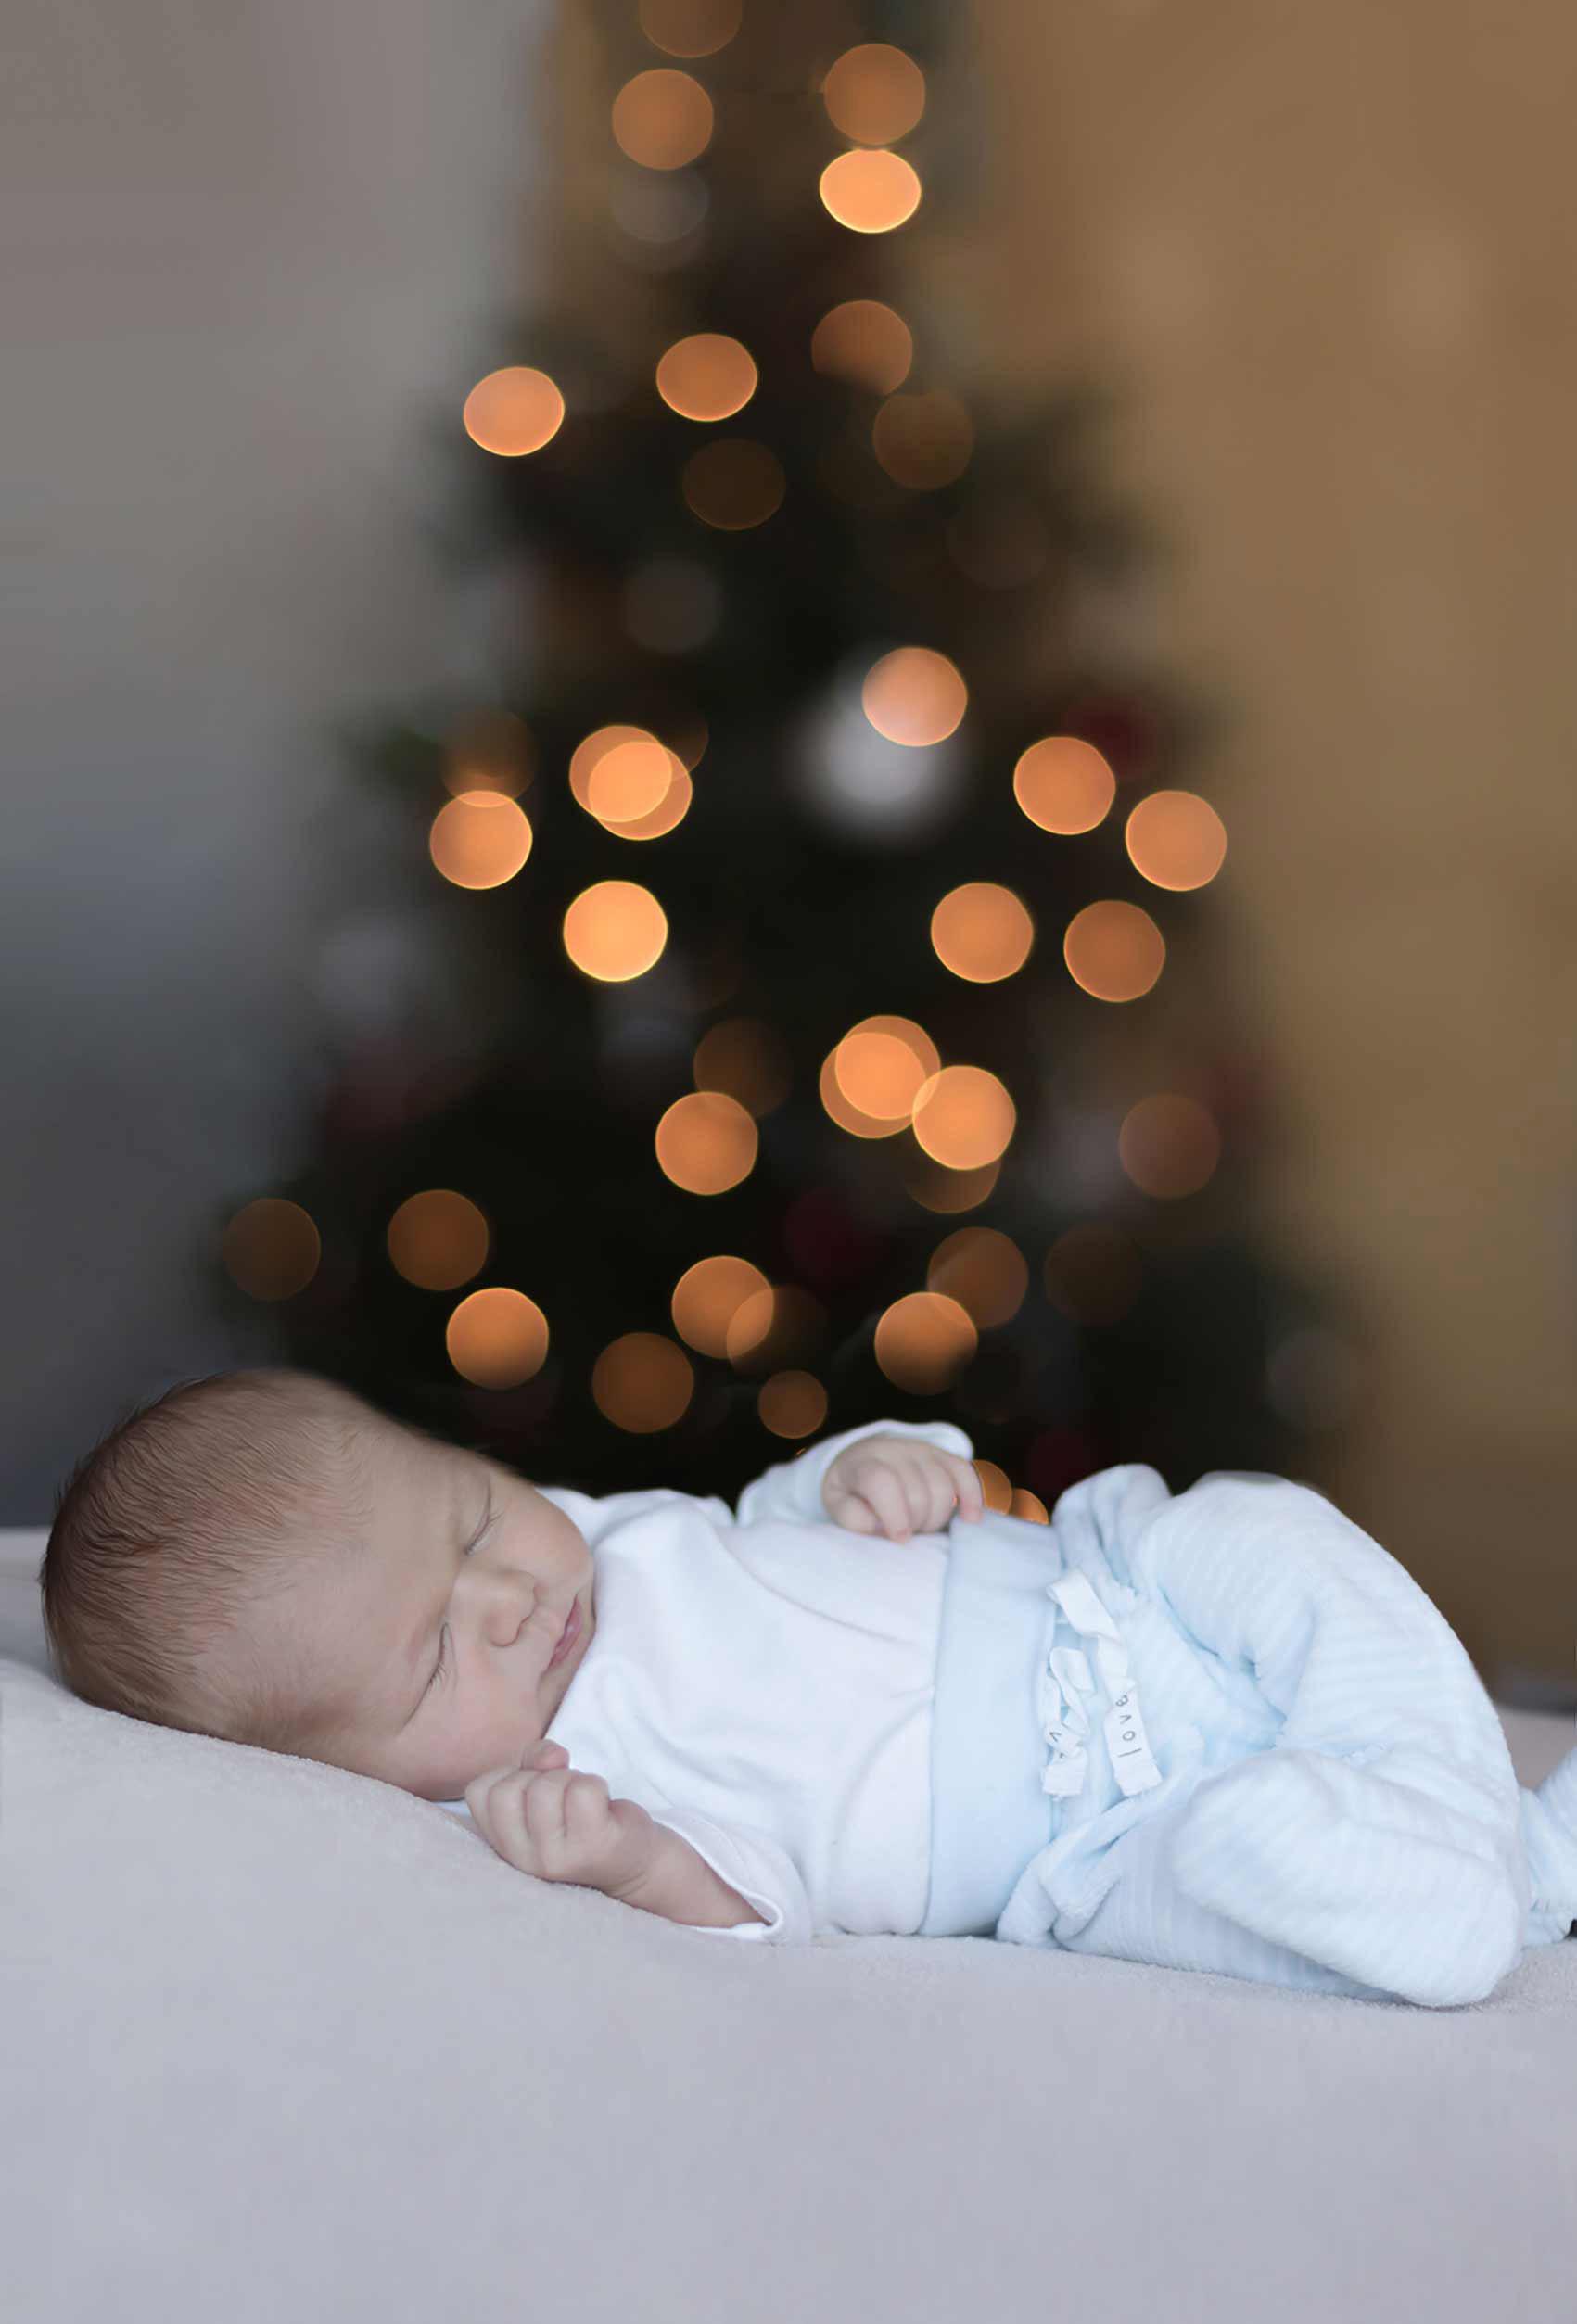 Newborn-Photography-BabyBoy-200kb-1